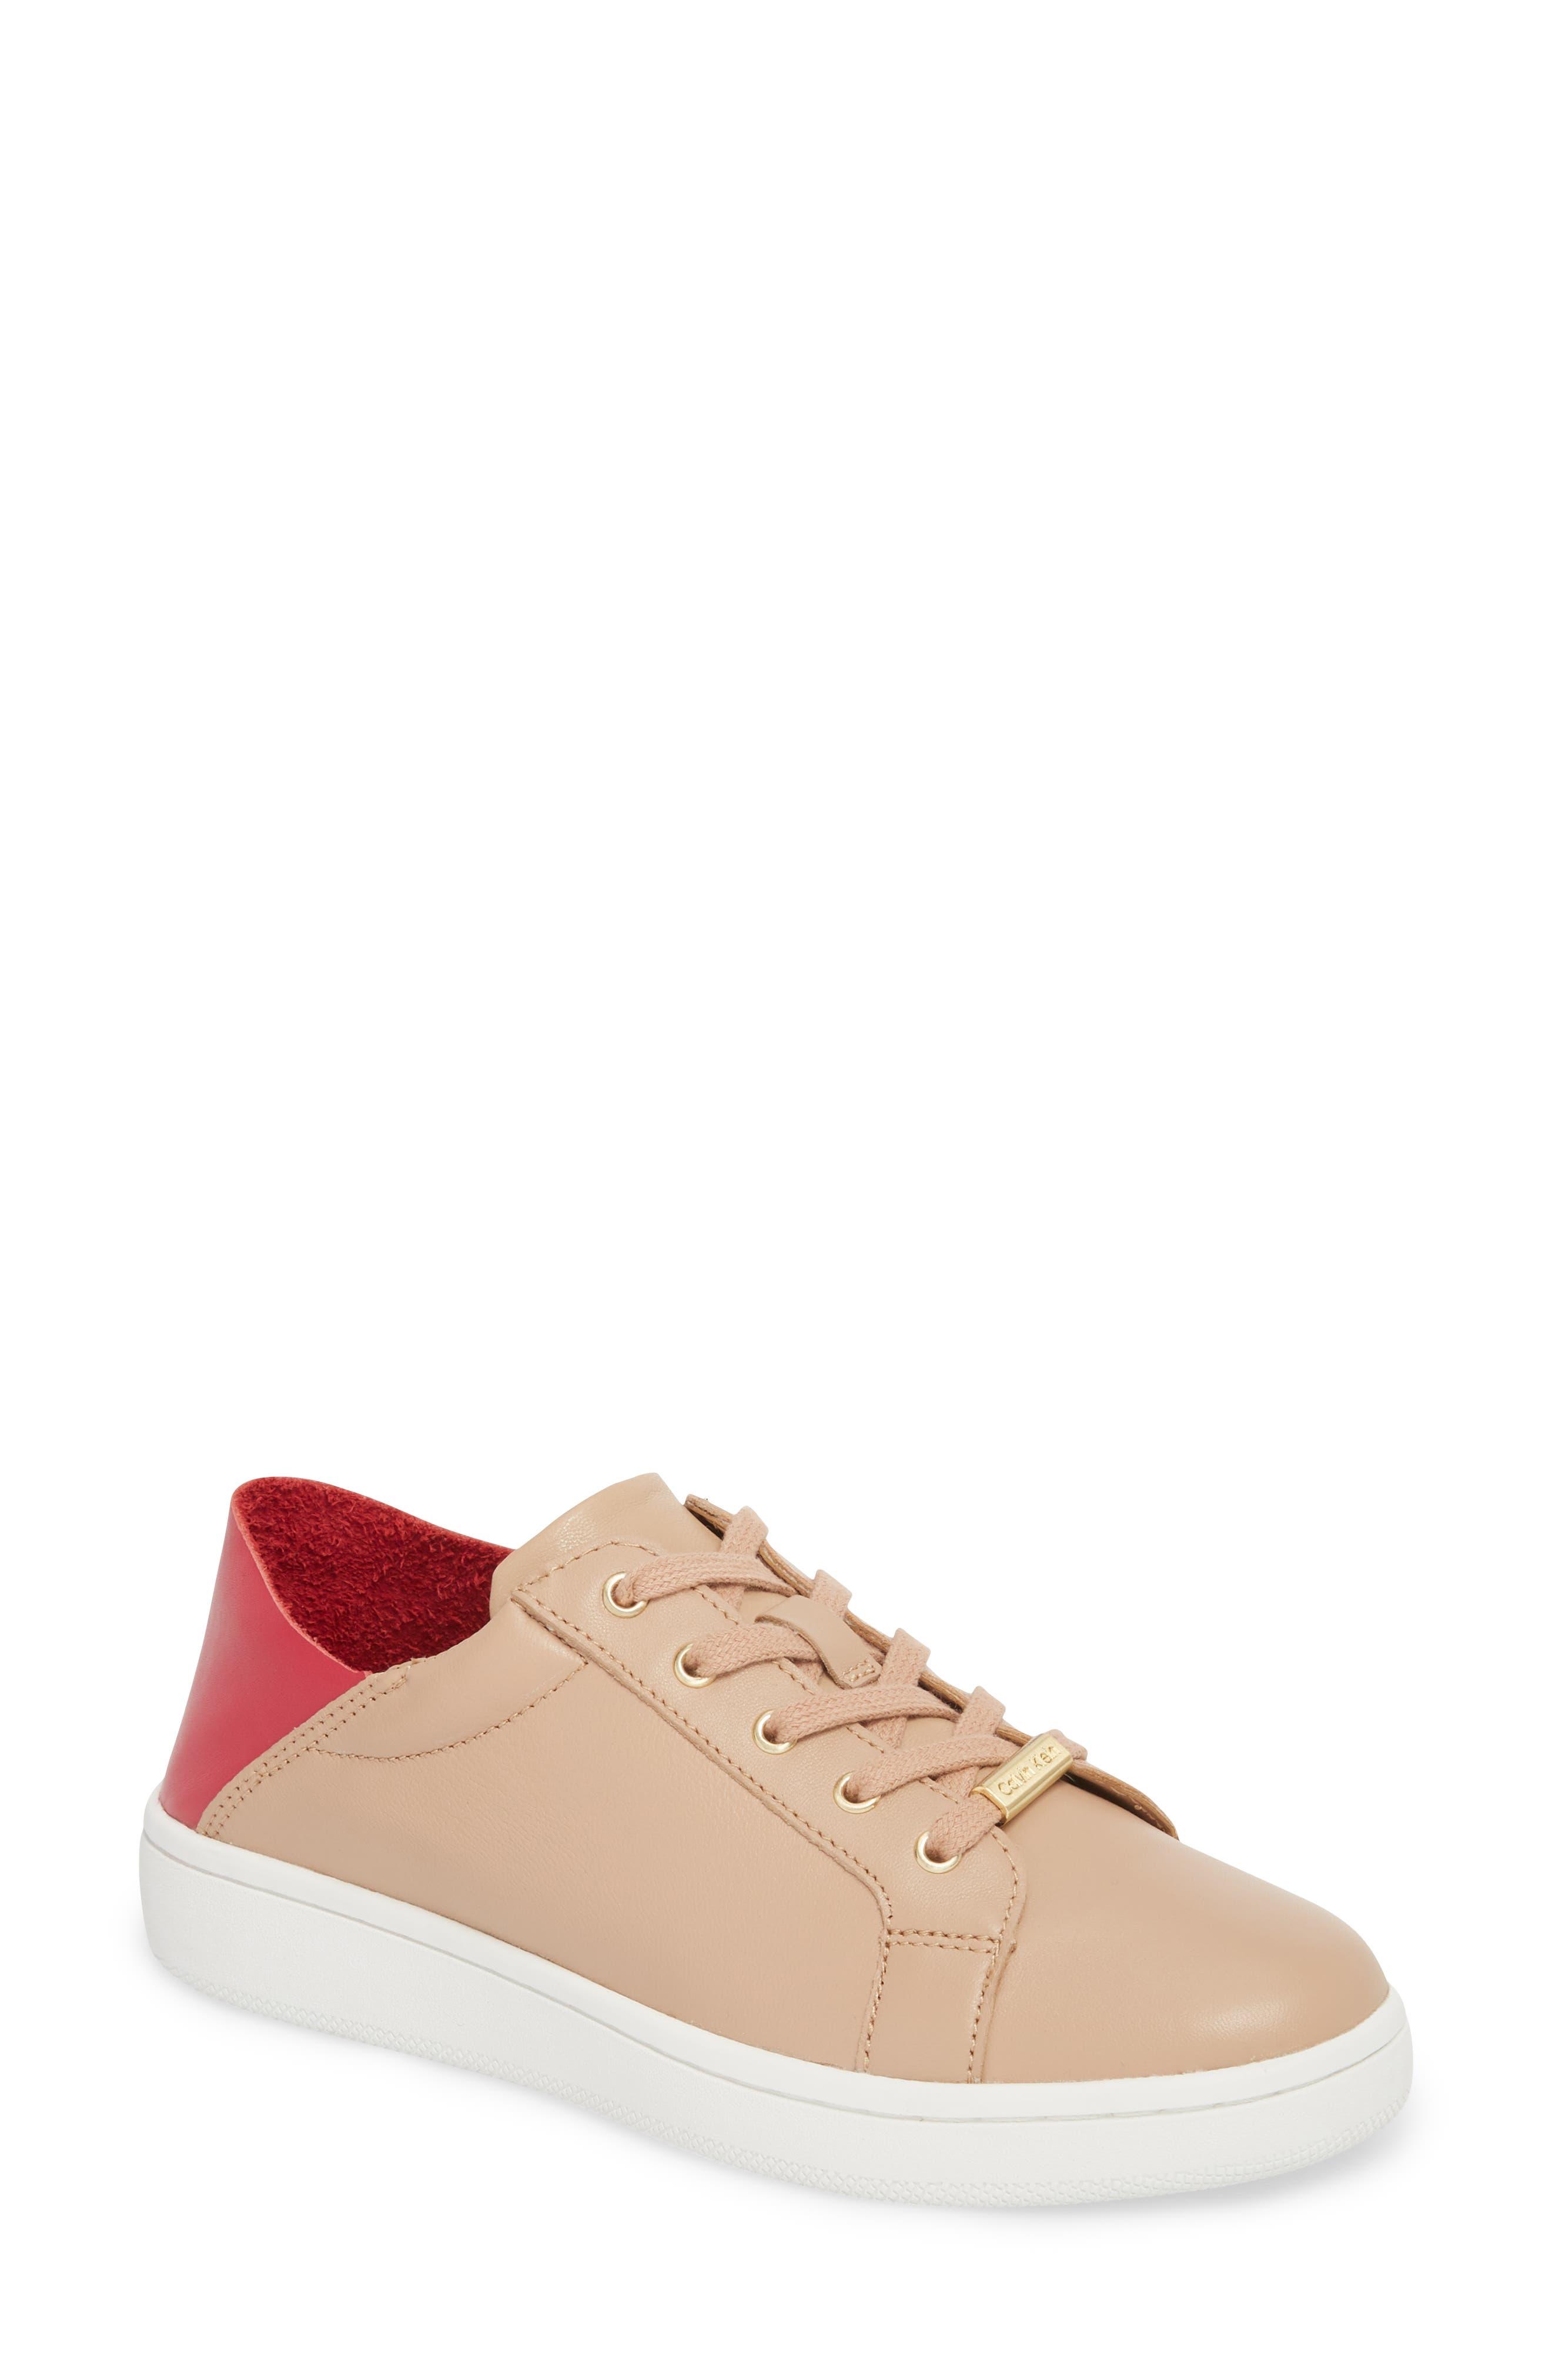 Danica Convertible Sneaker,                             Alternate thumbnail 3, color,                             Desert Sand Leather